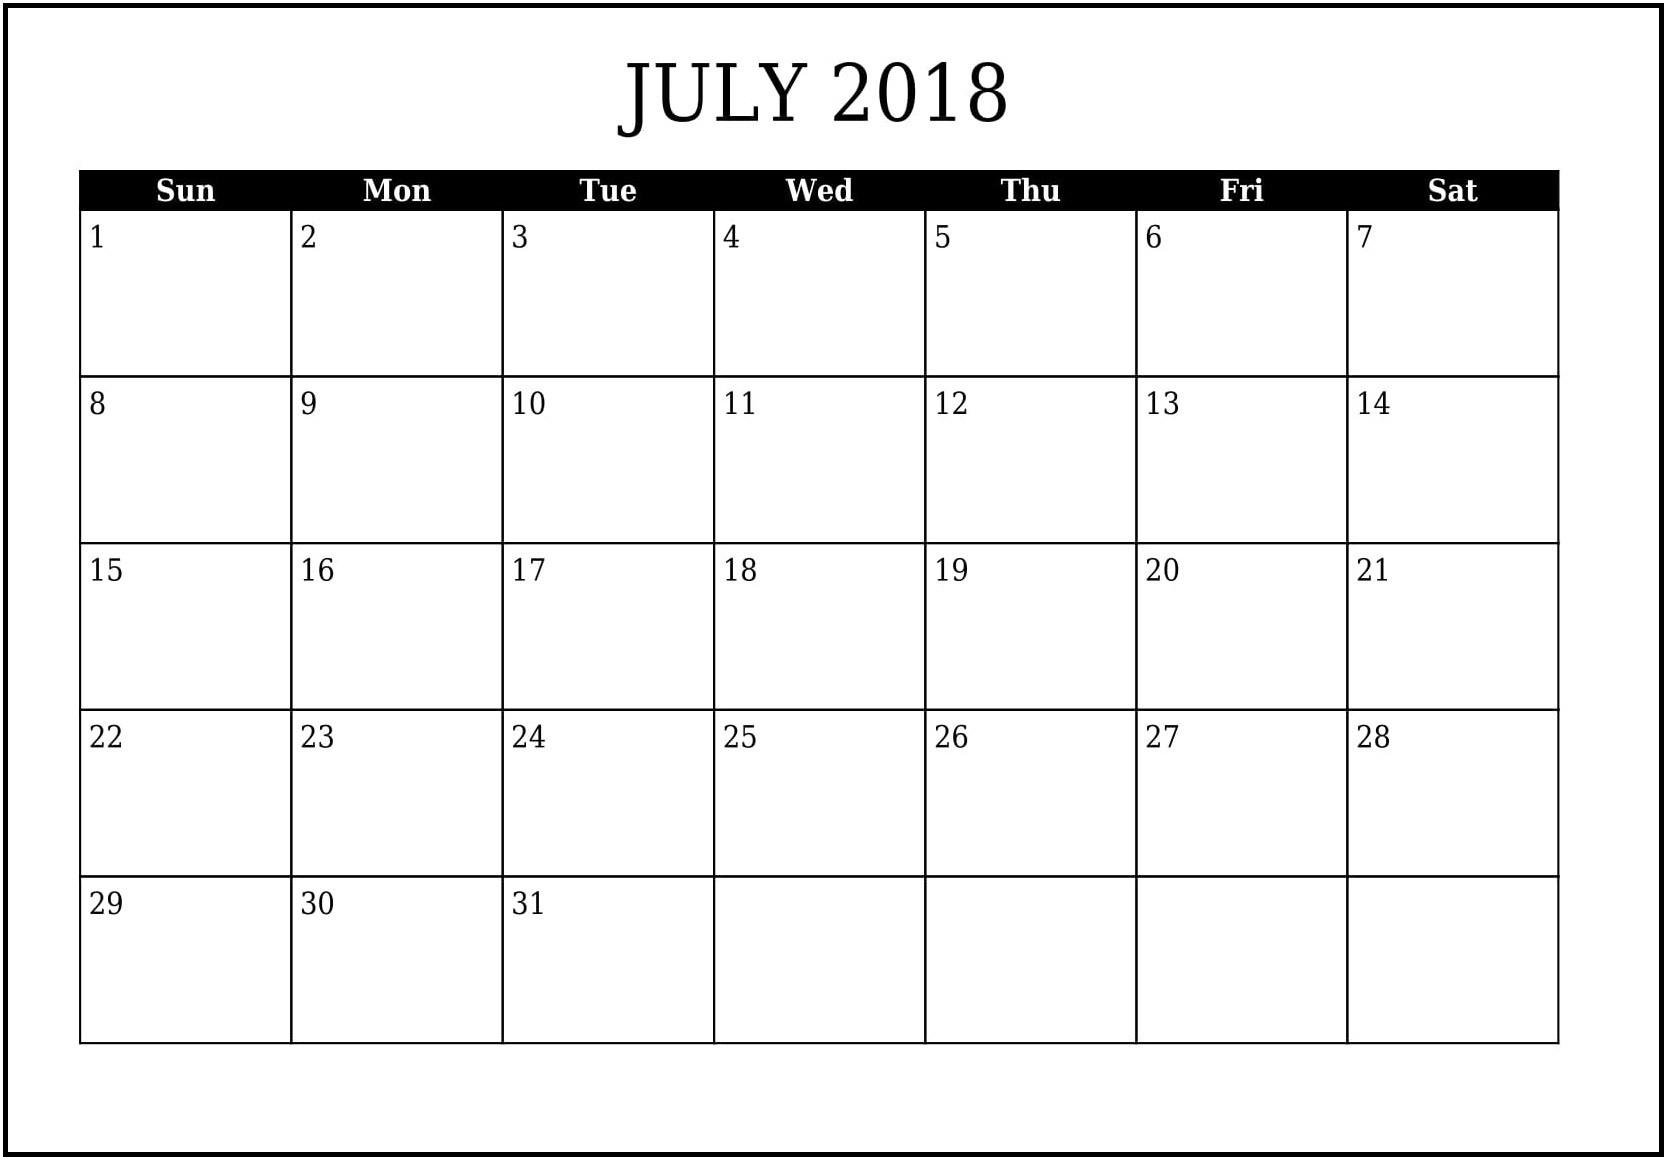 Calendar For July 2018 Printable | Business Calendar Templates within Cute Calendar Templates July